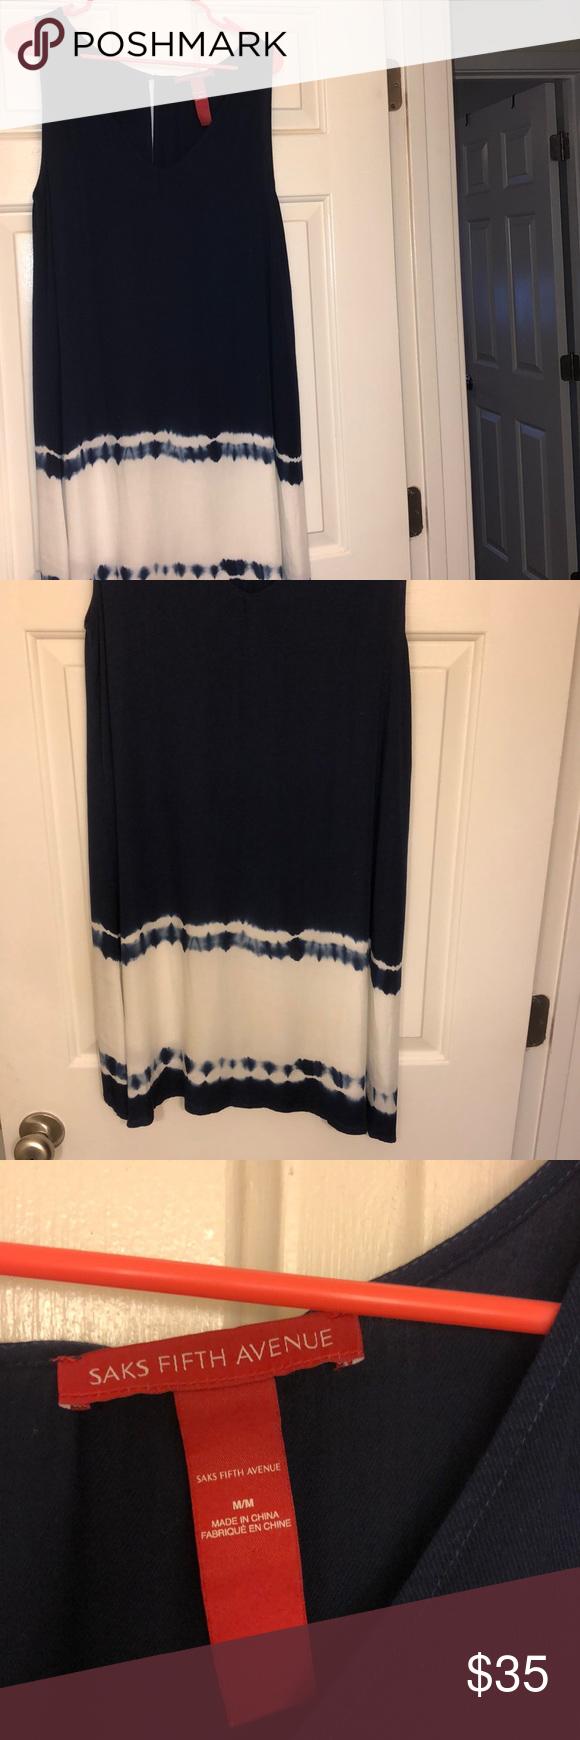 Saks Fifth Avenue Blue Dress With Tie Dye Style Bottom Great